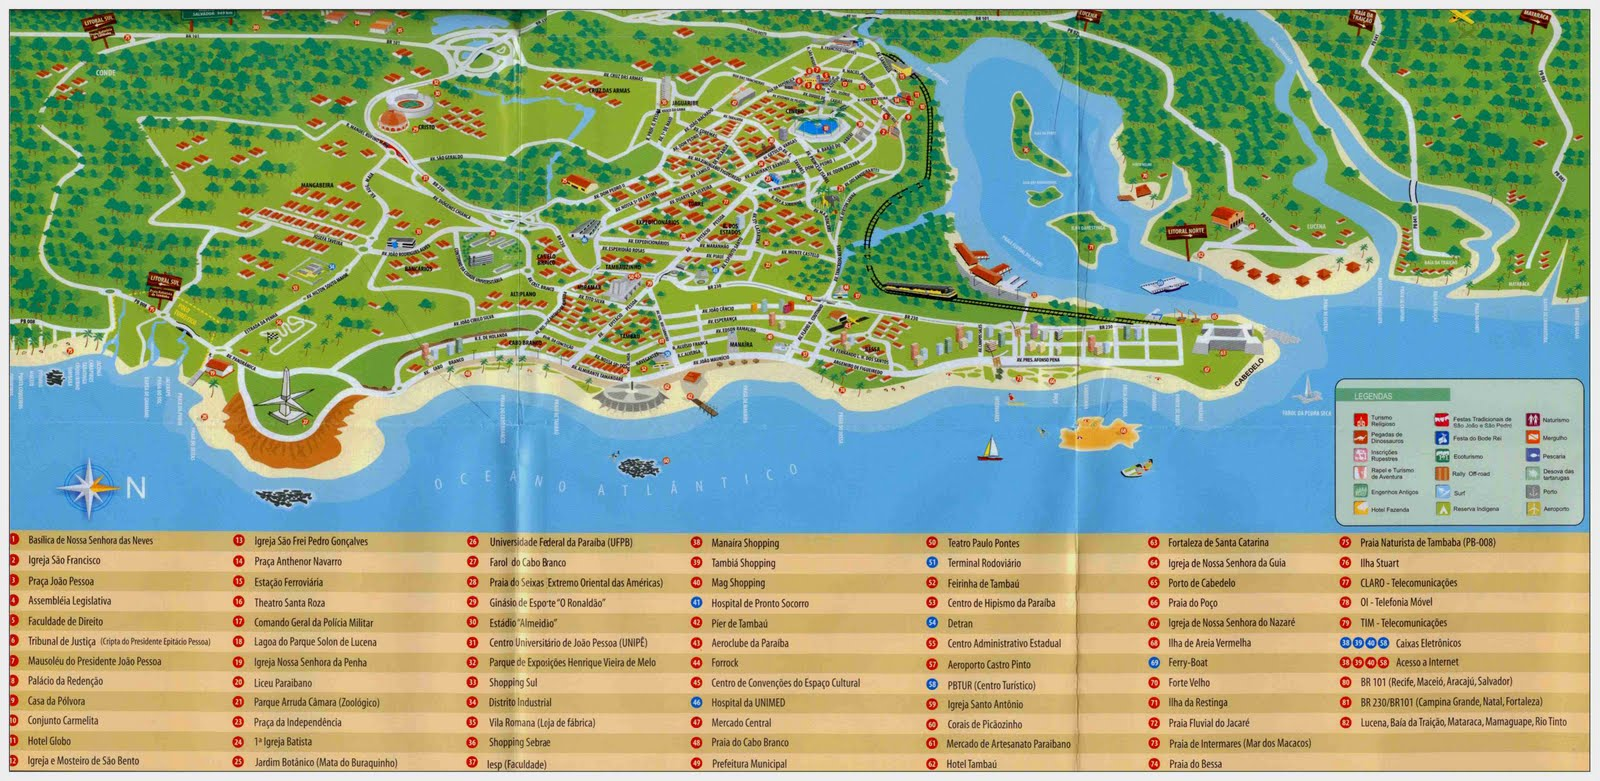 mapa-turistico-de-joao-pessoa.jpg